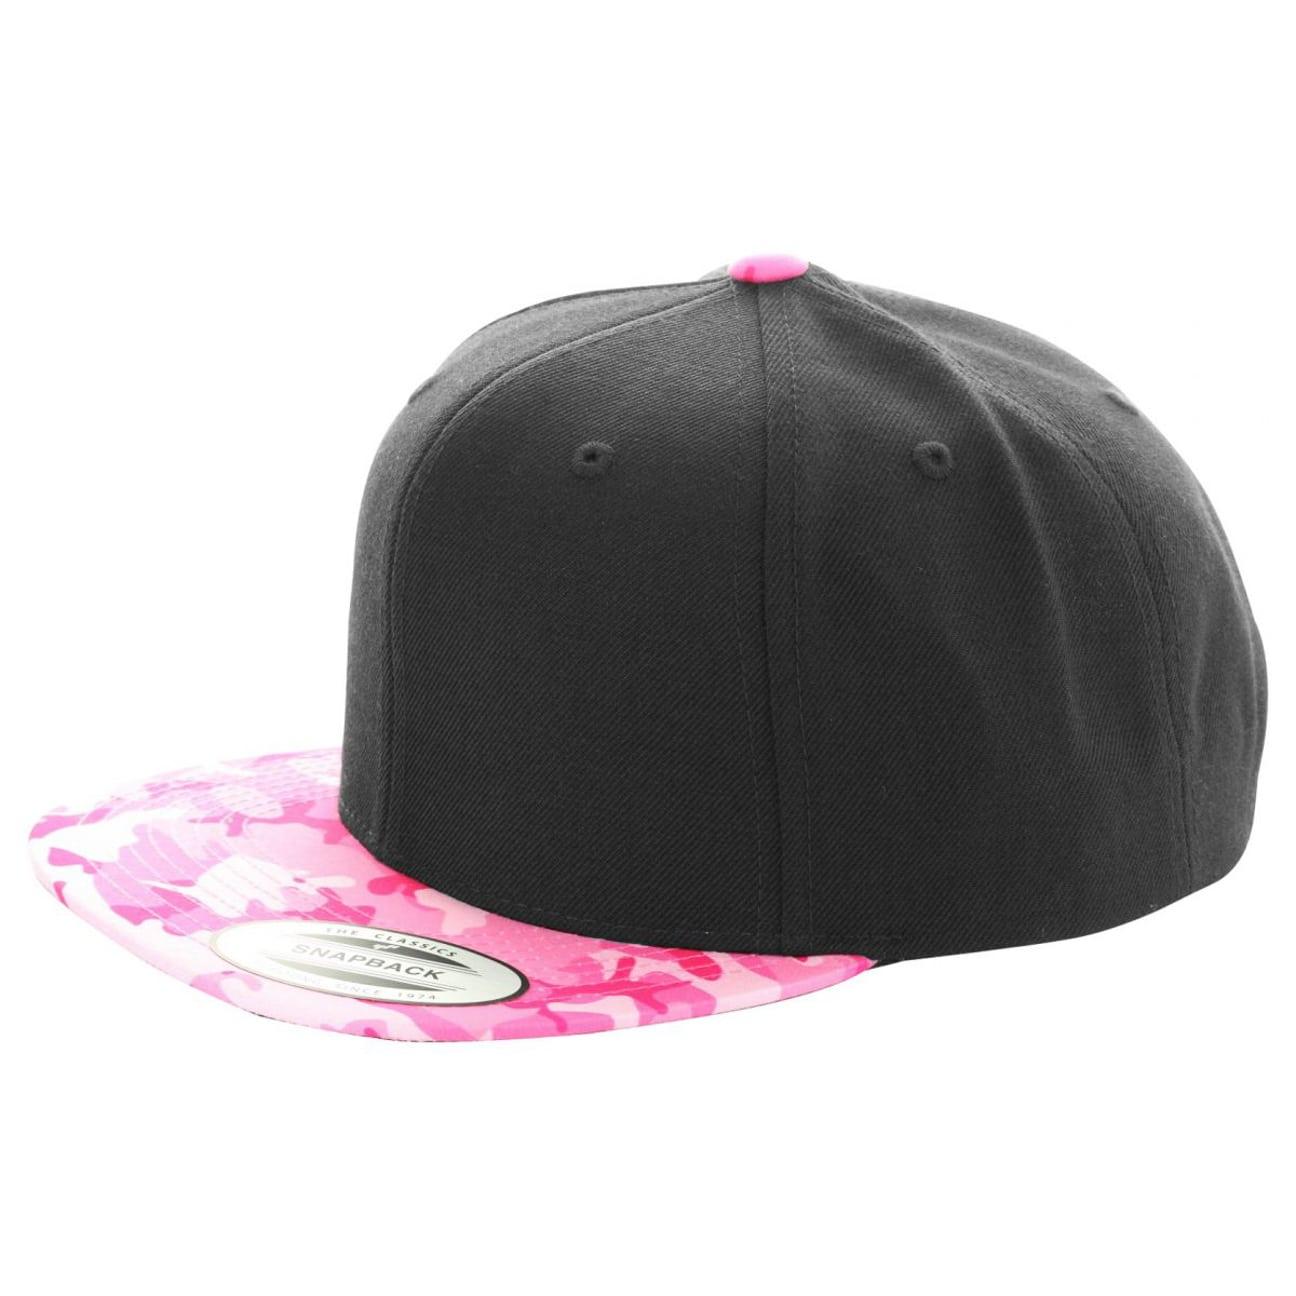 Gorra Snapback Flexfit Camuflaje - Gorras - sombreroshop.es faf577d878b